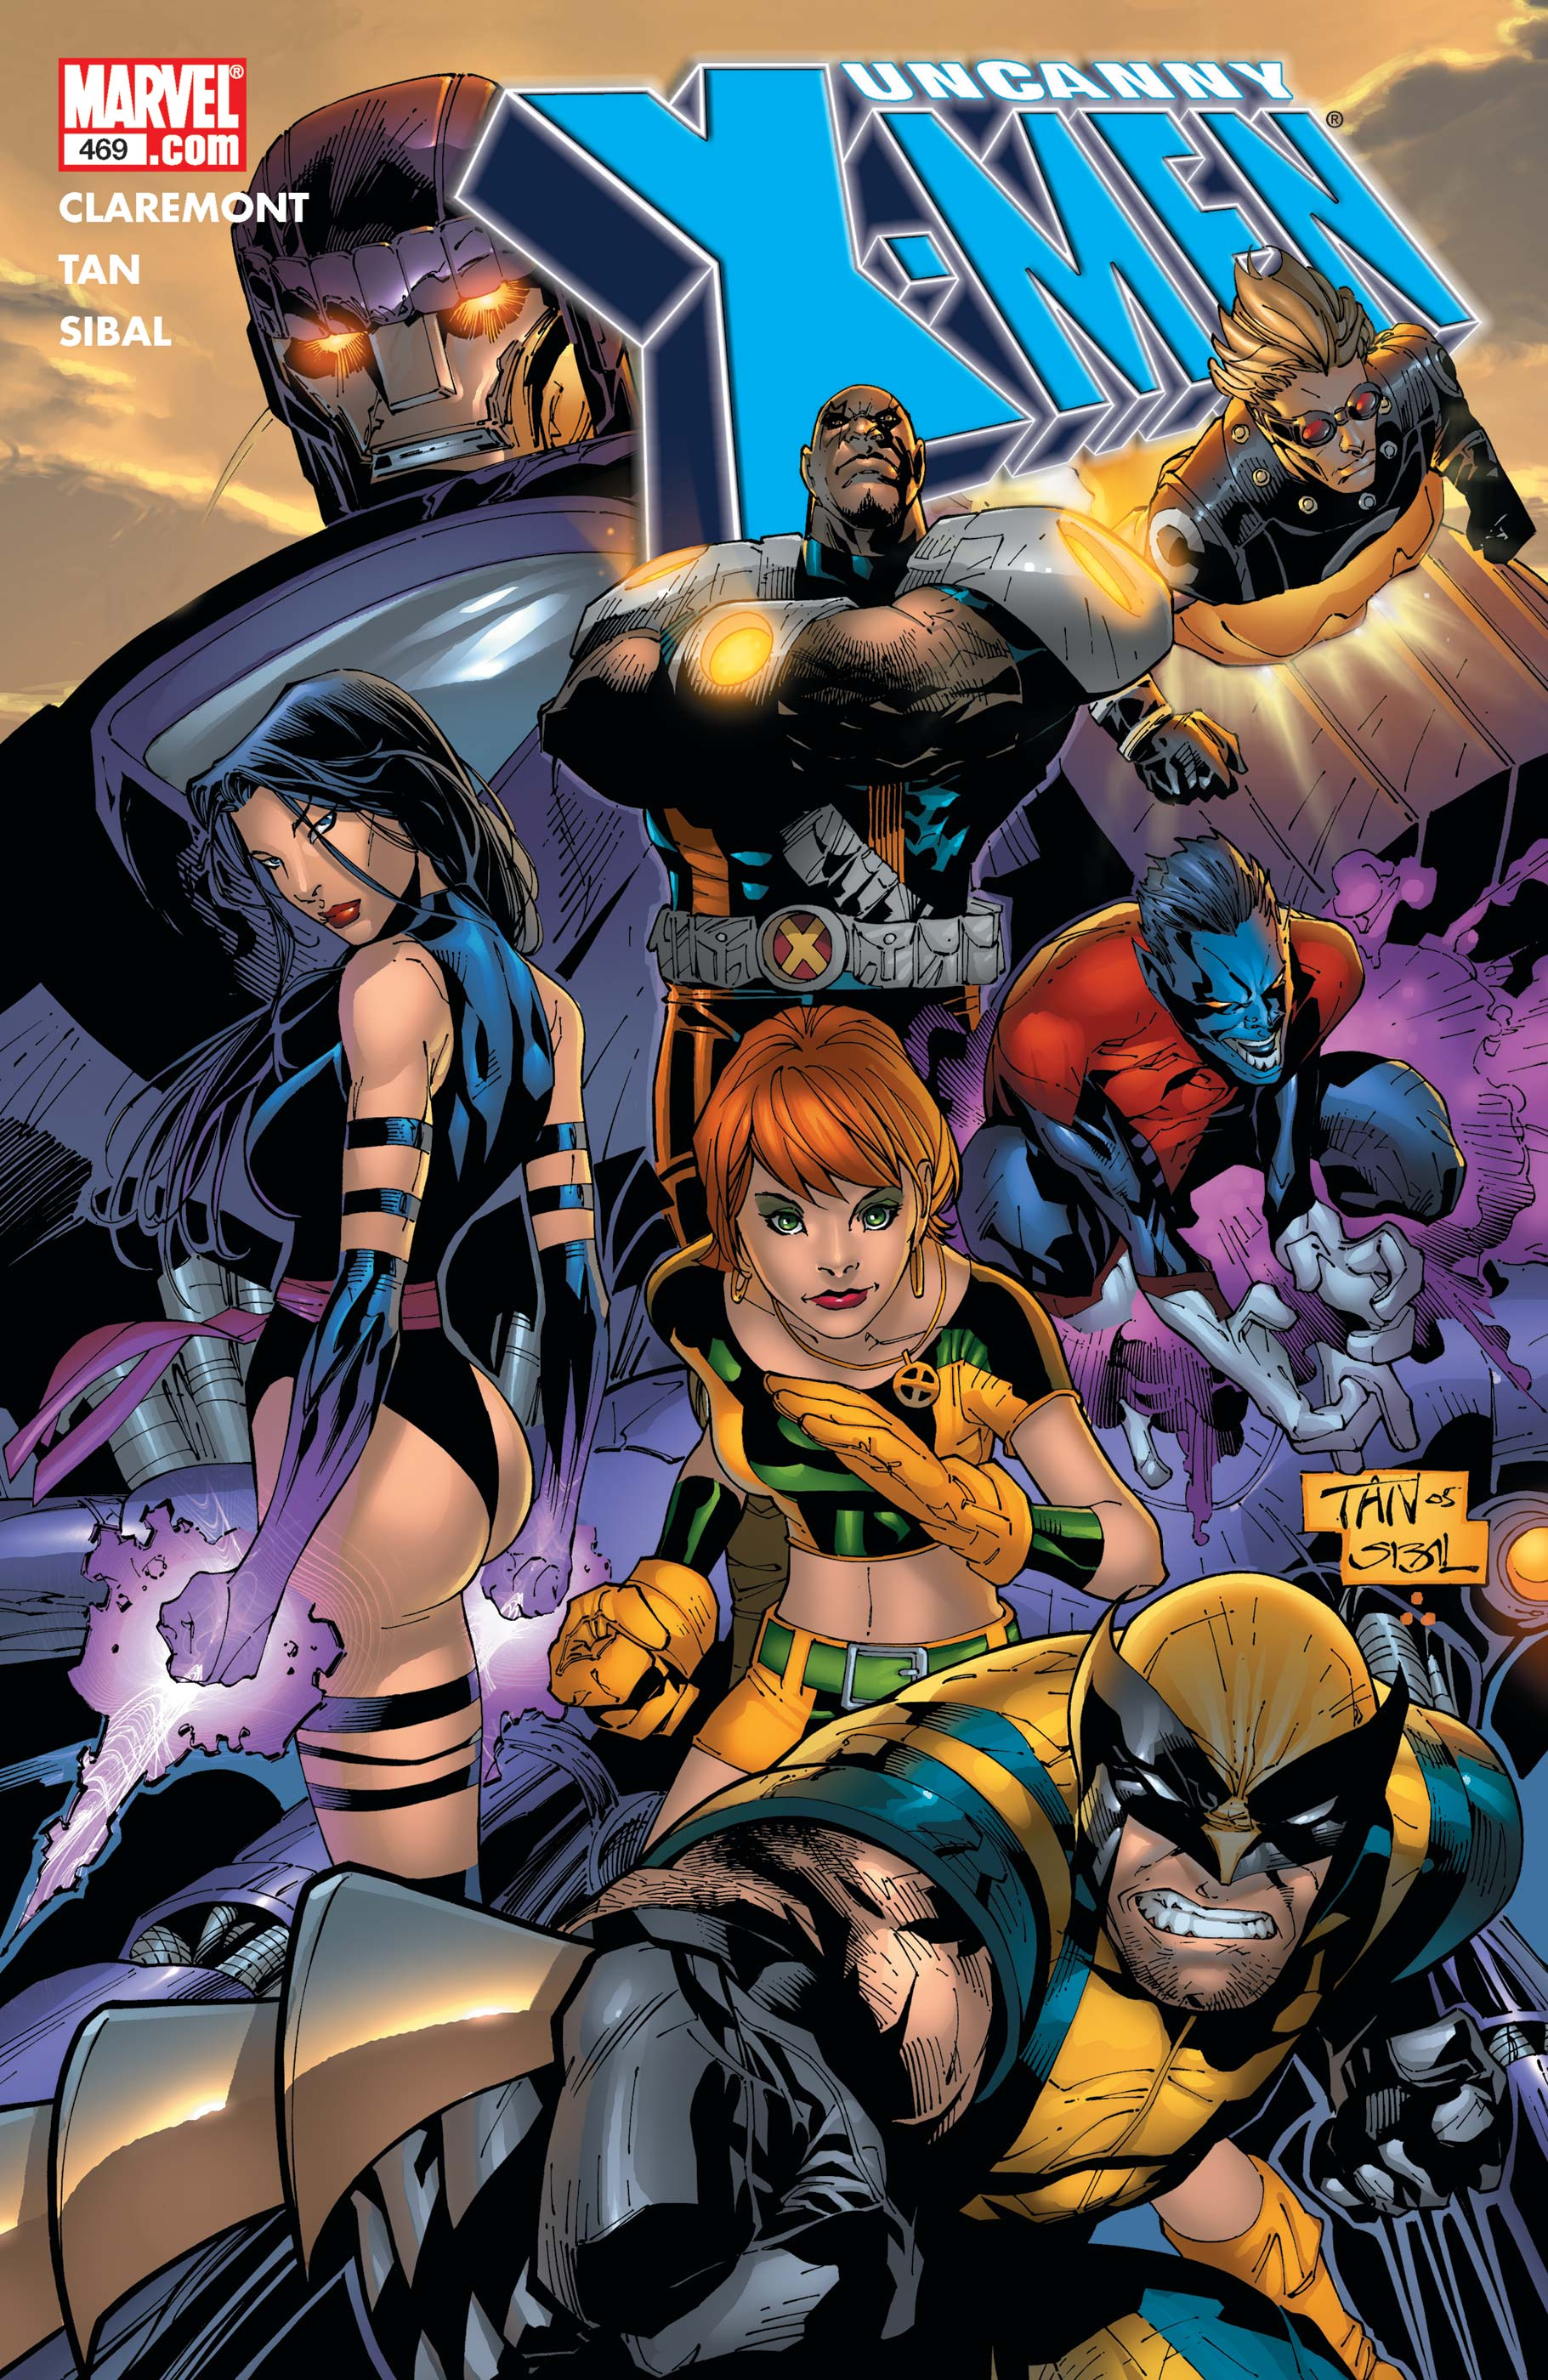 Uncanny X-Men (1963) #469